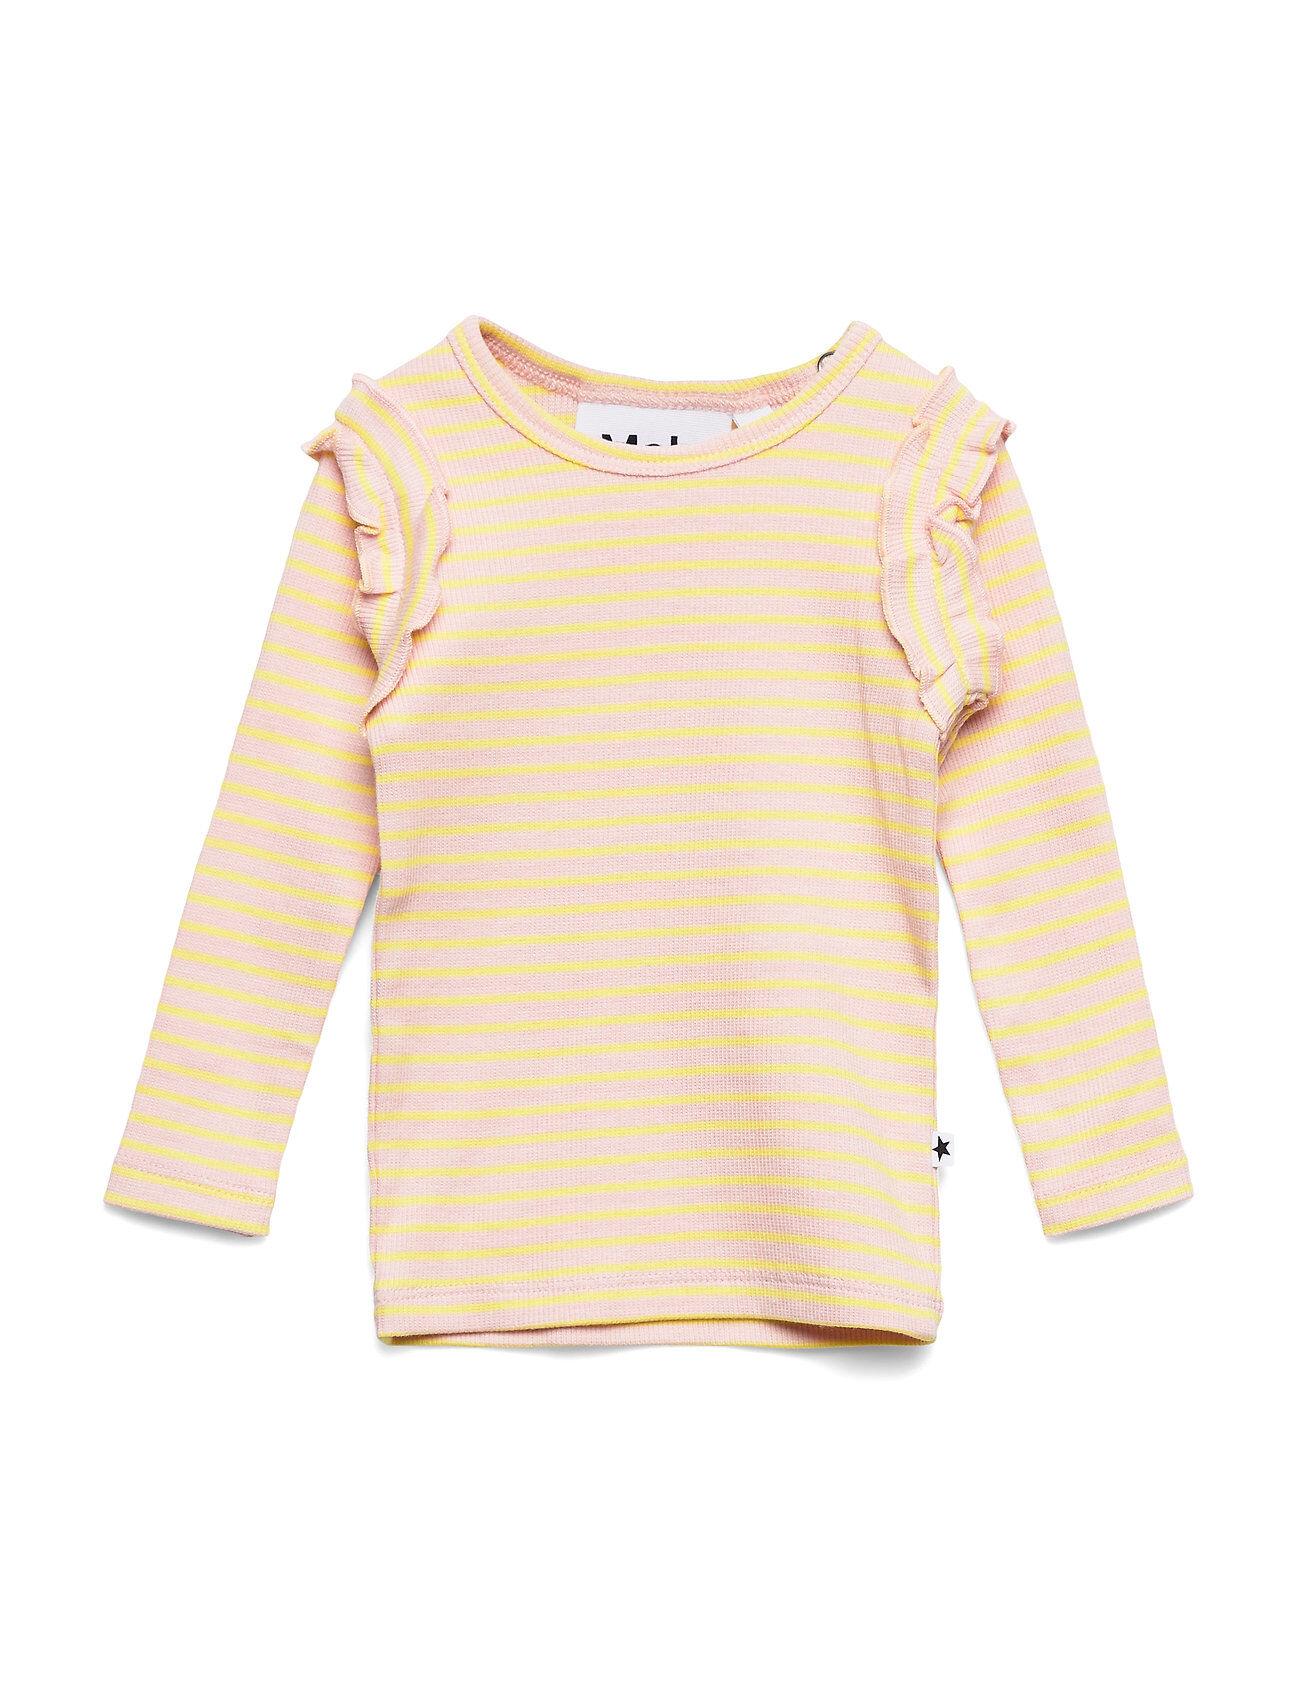 Molo Emma T-shirts Long-sleeved T-shirts Molo